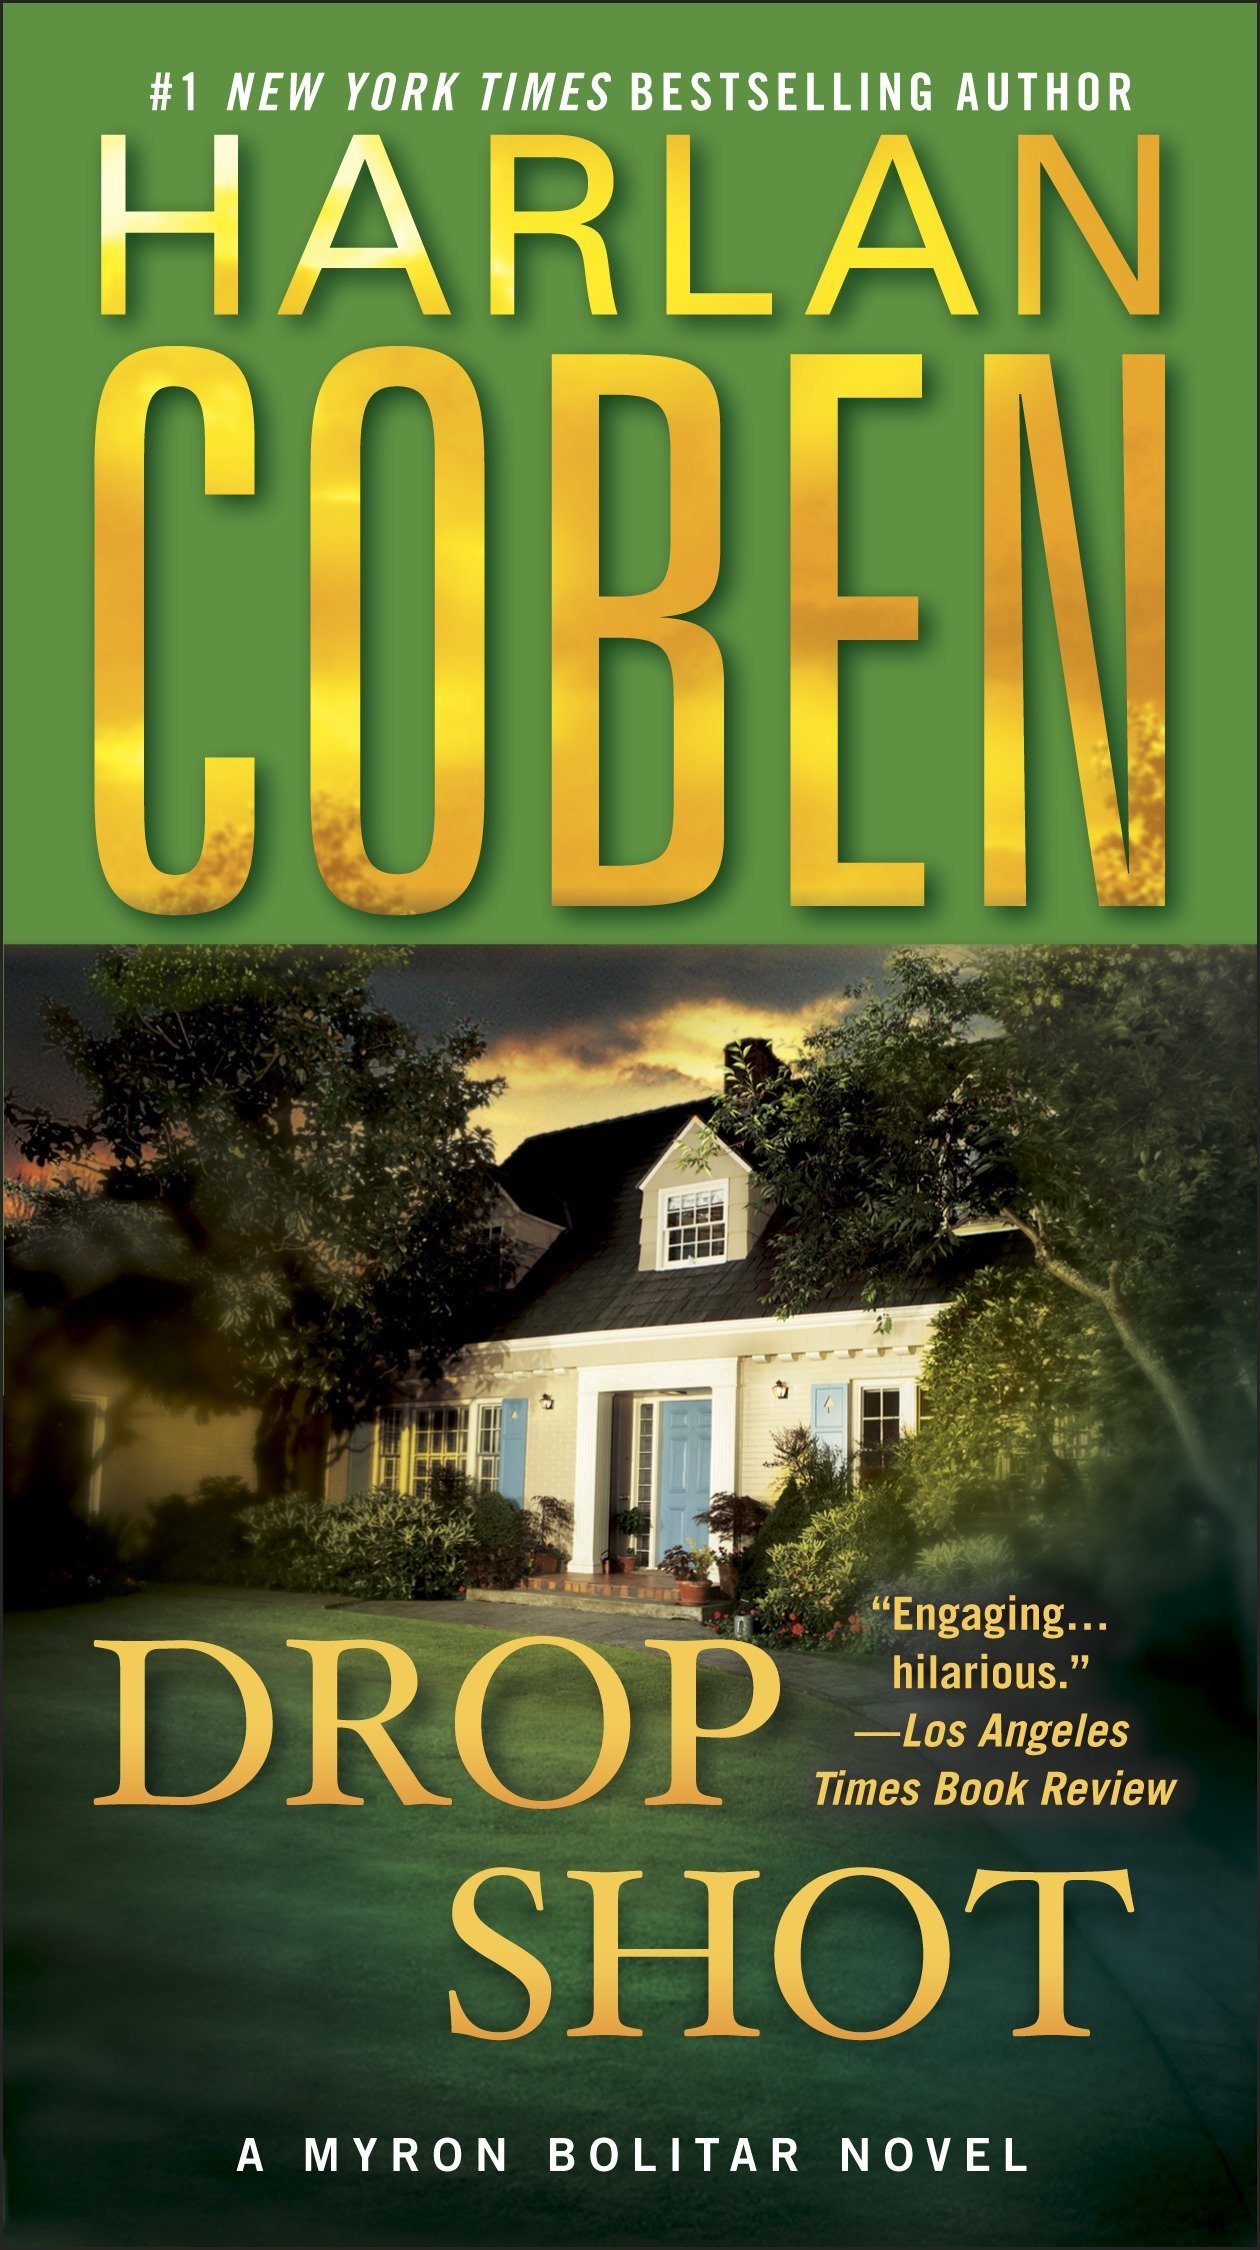 Amazon Fr Drop Shot A Myron Bolitar Novel Harlan Coben